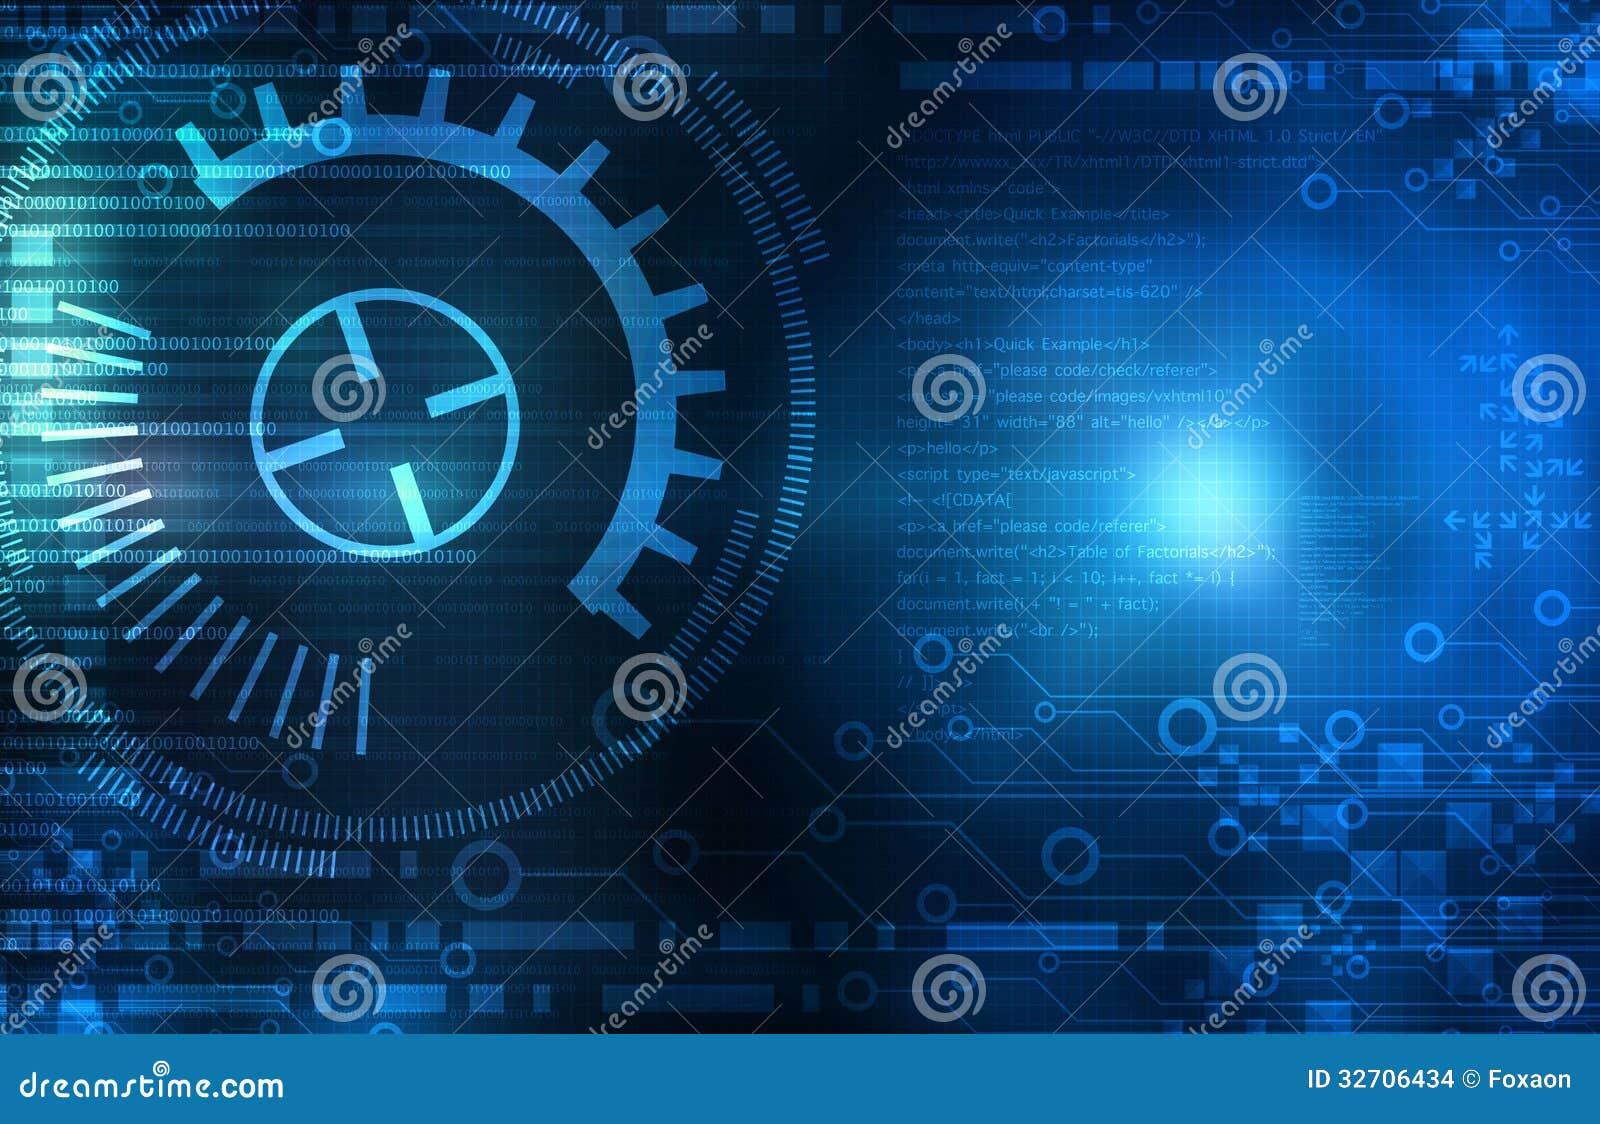 fluorescent wallpaper download